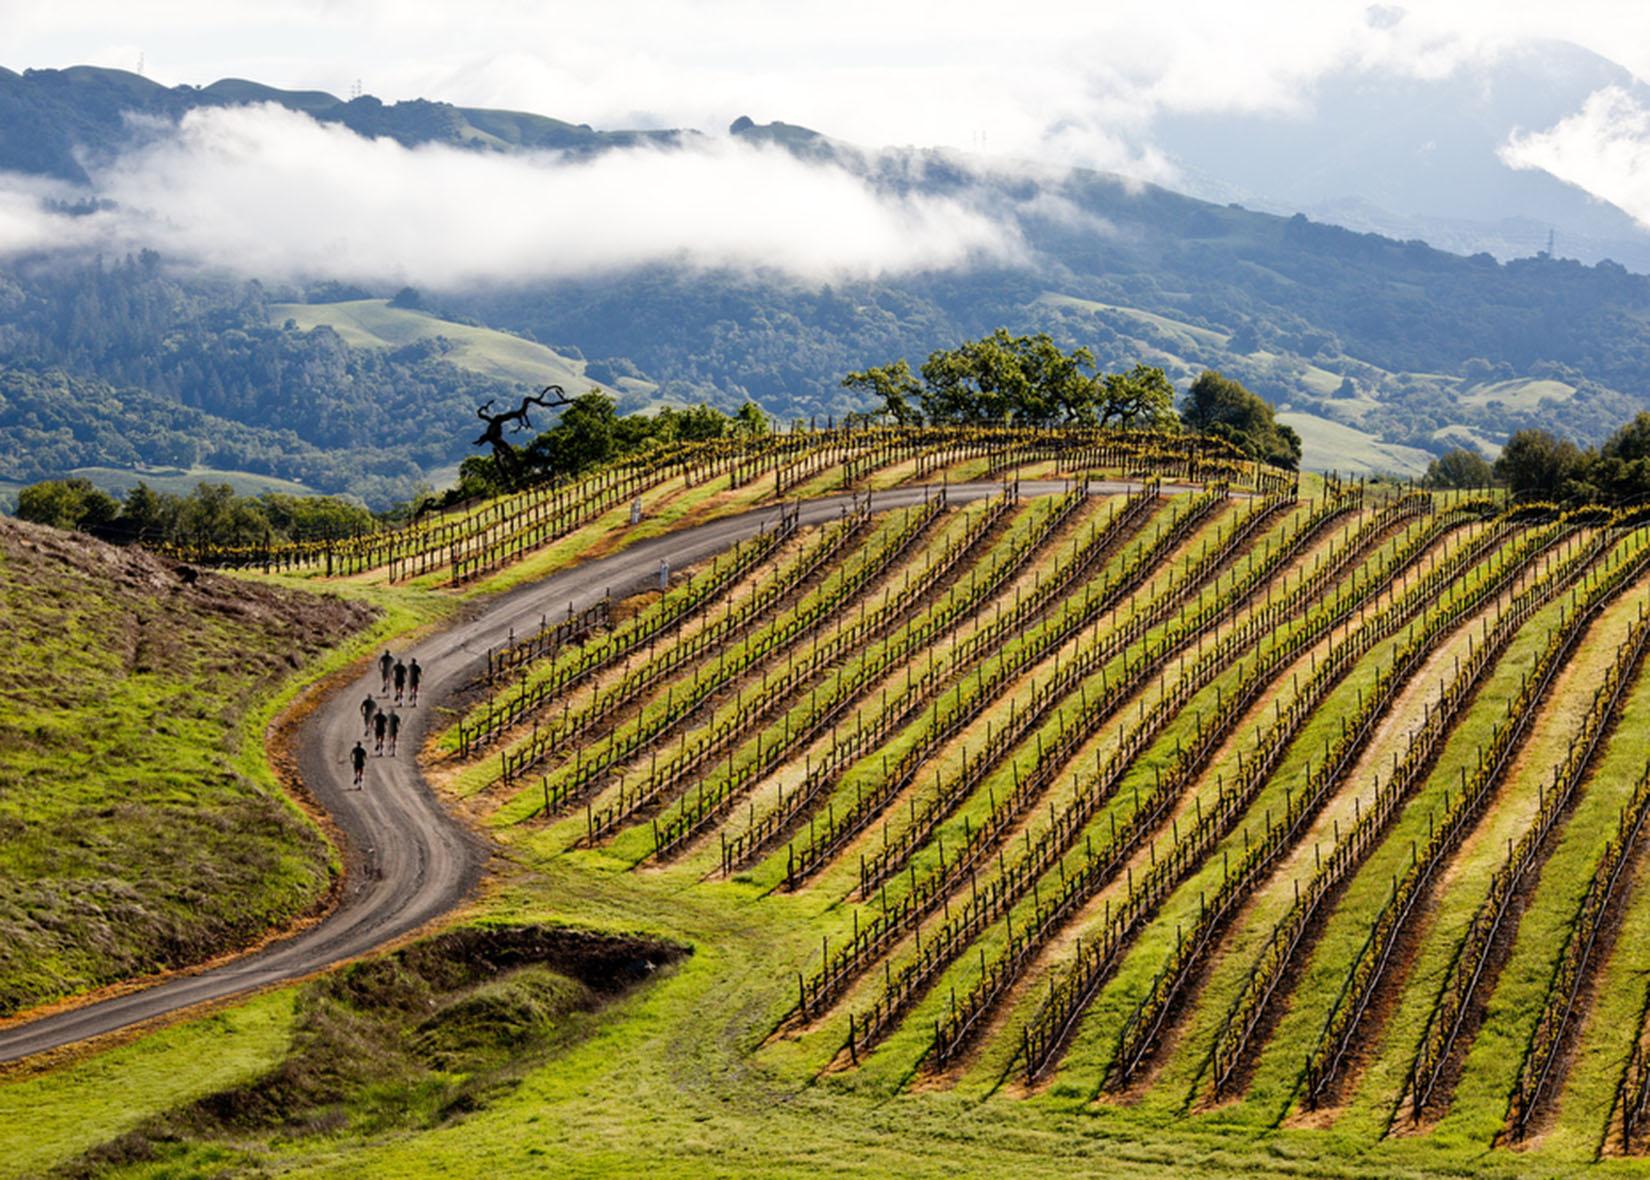 Jordan Winery, Sonoma County, California